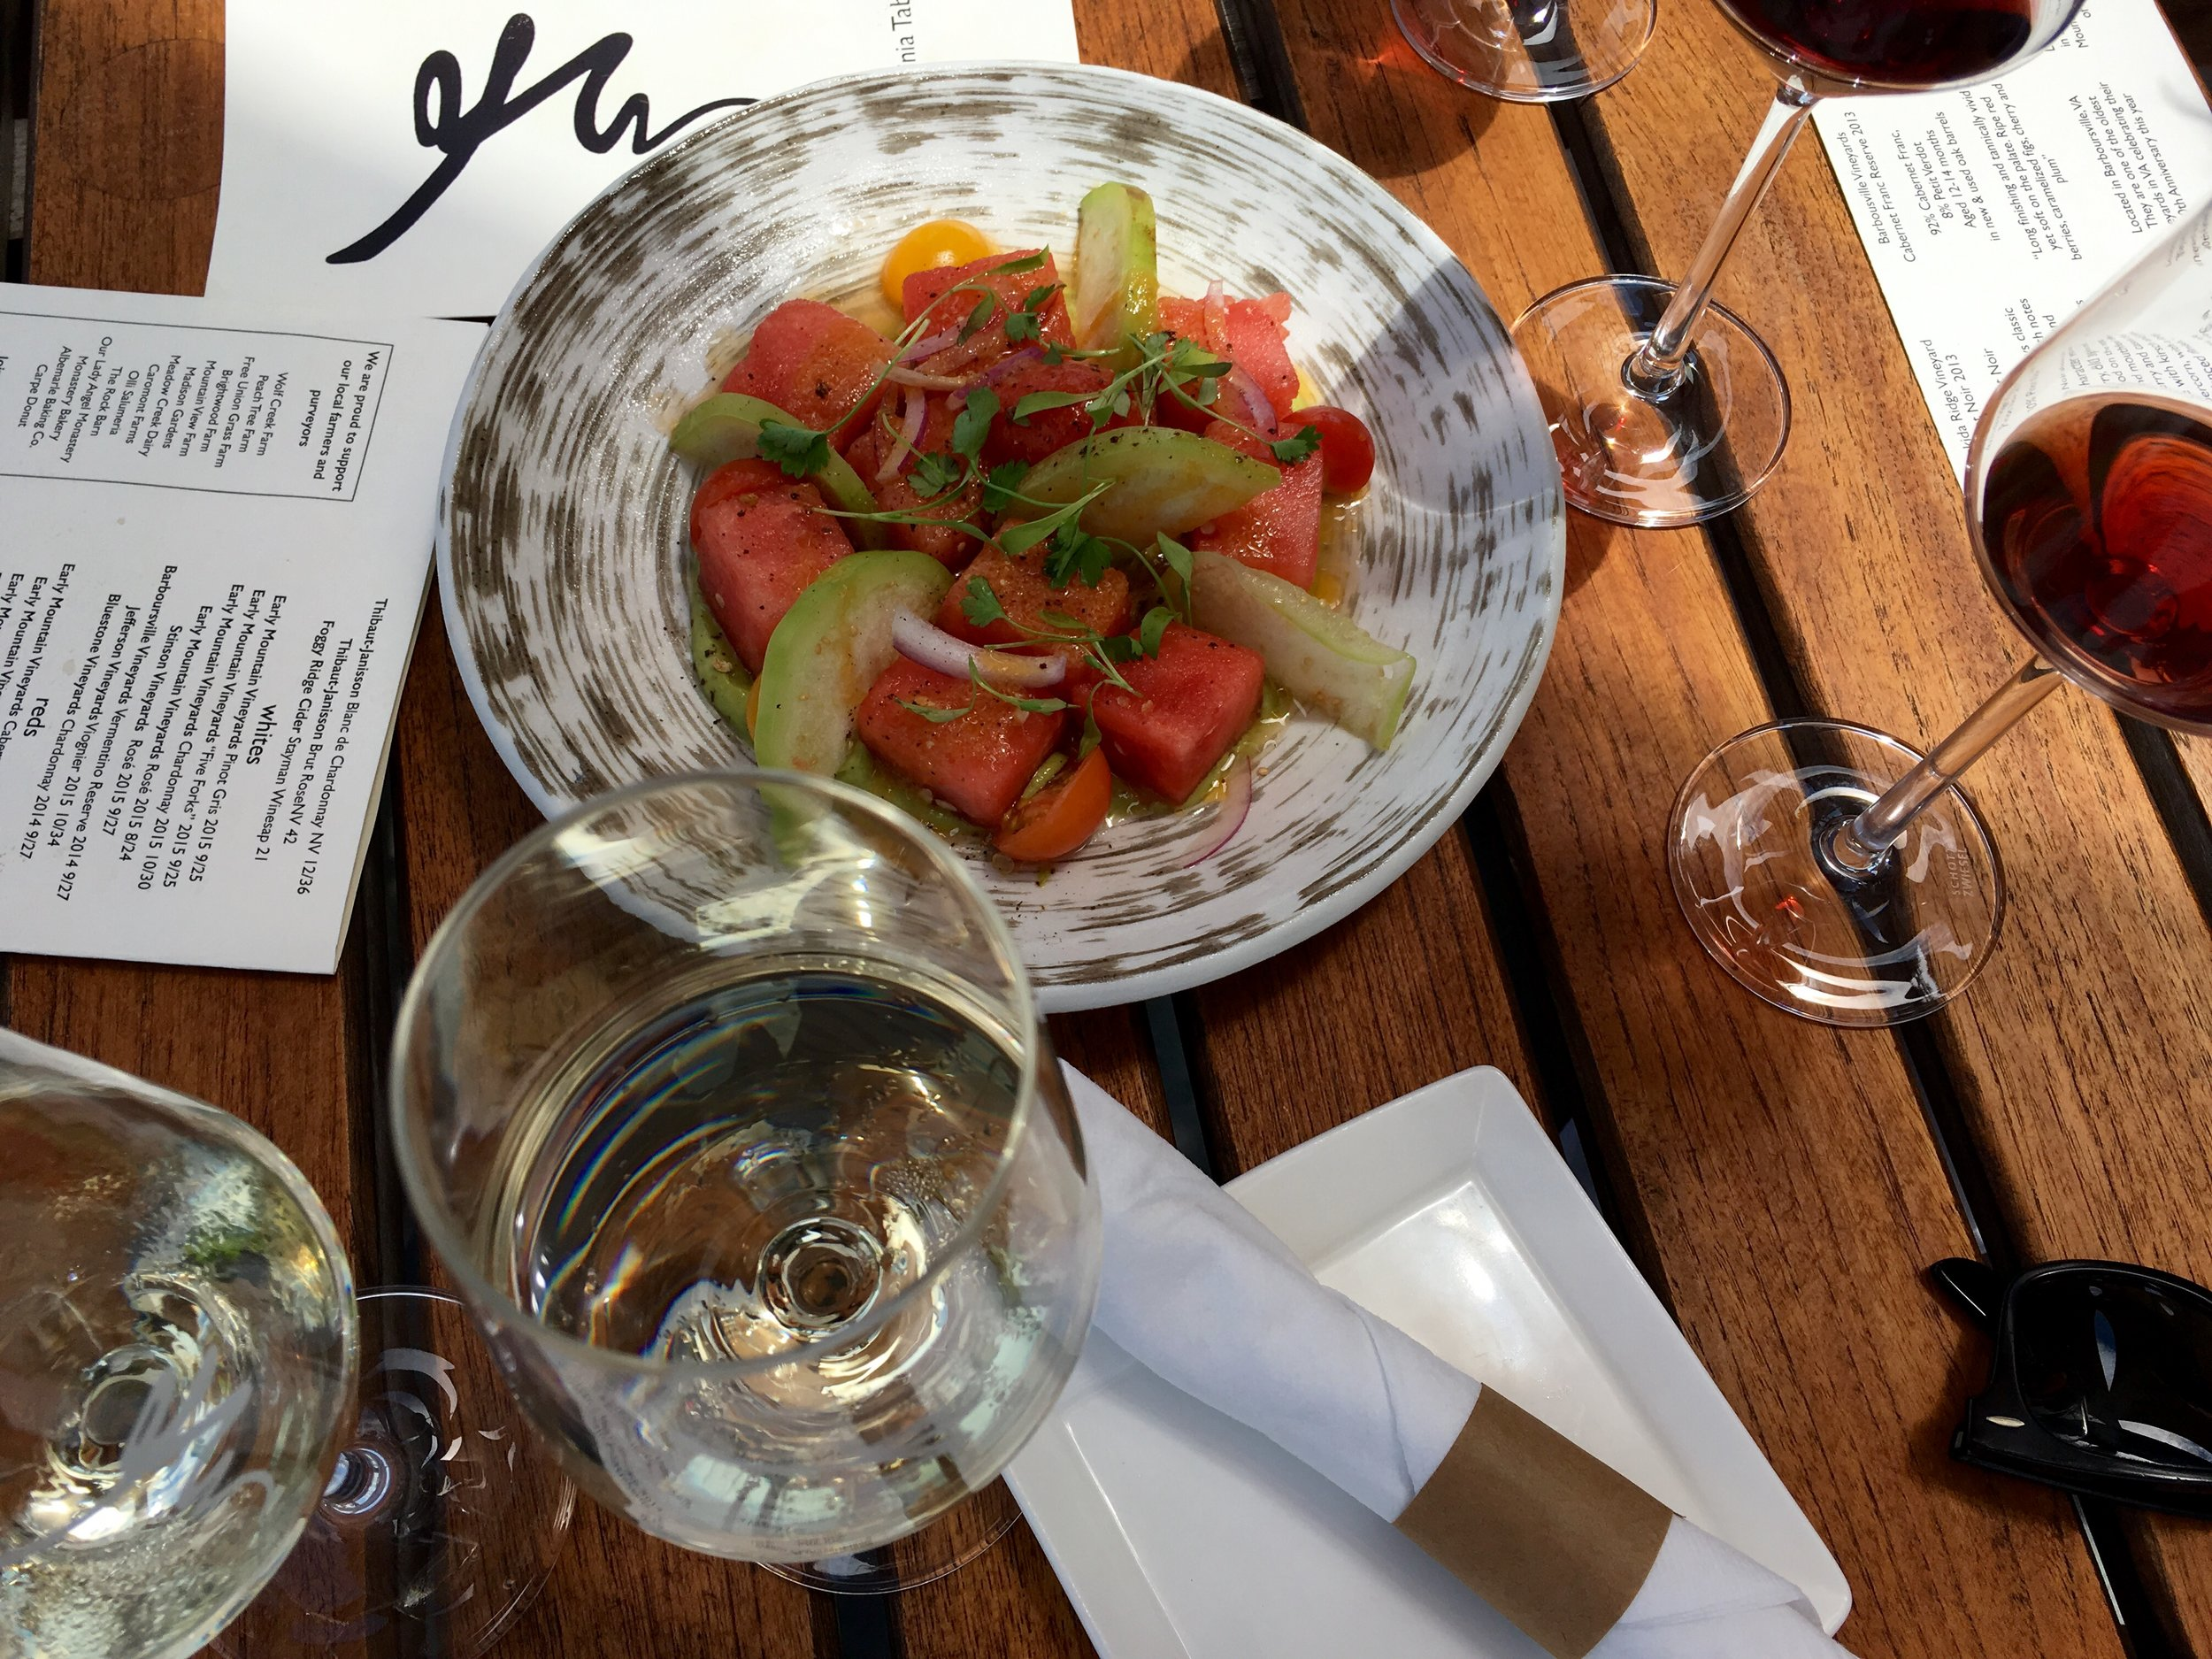 A beautiful salad at Early Mountain Vineyards